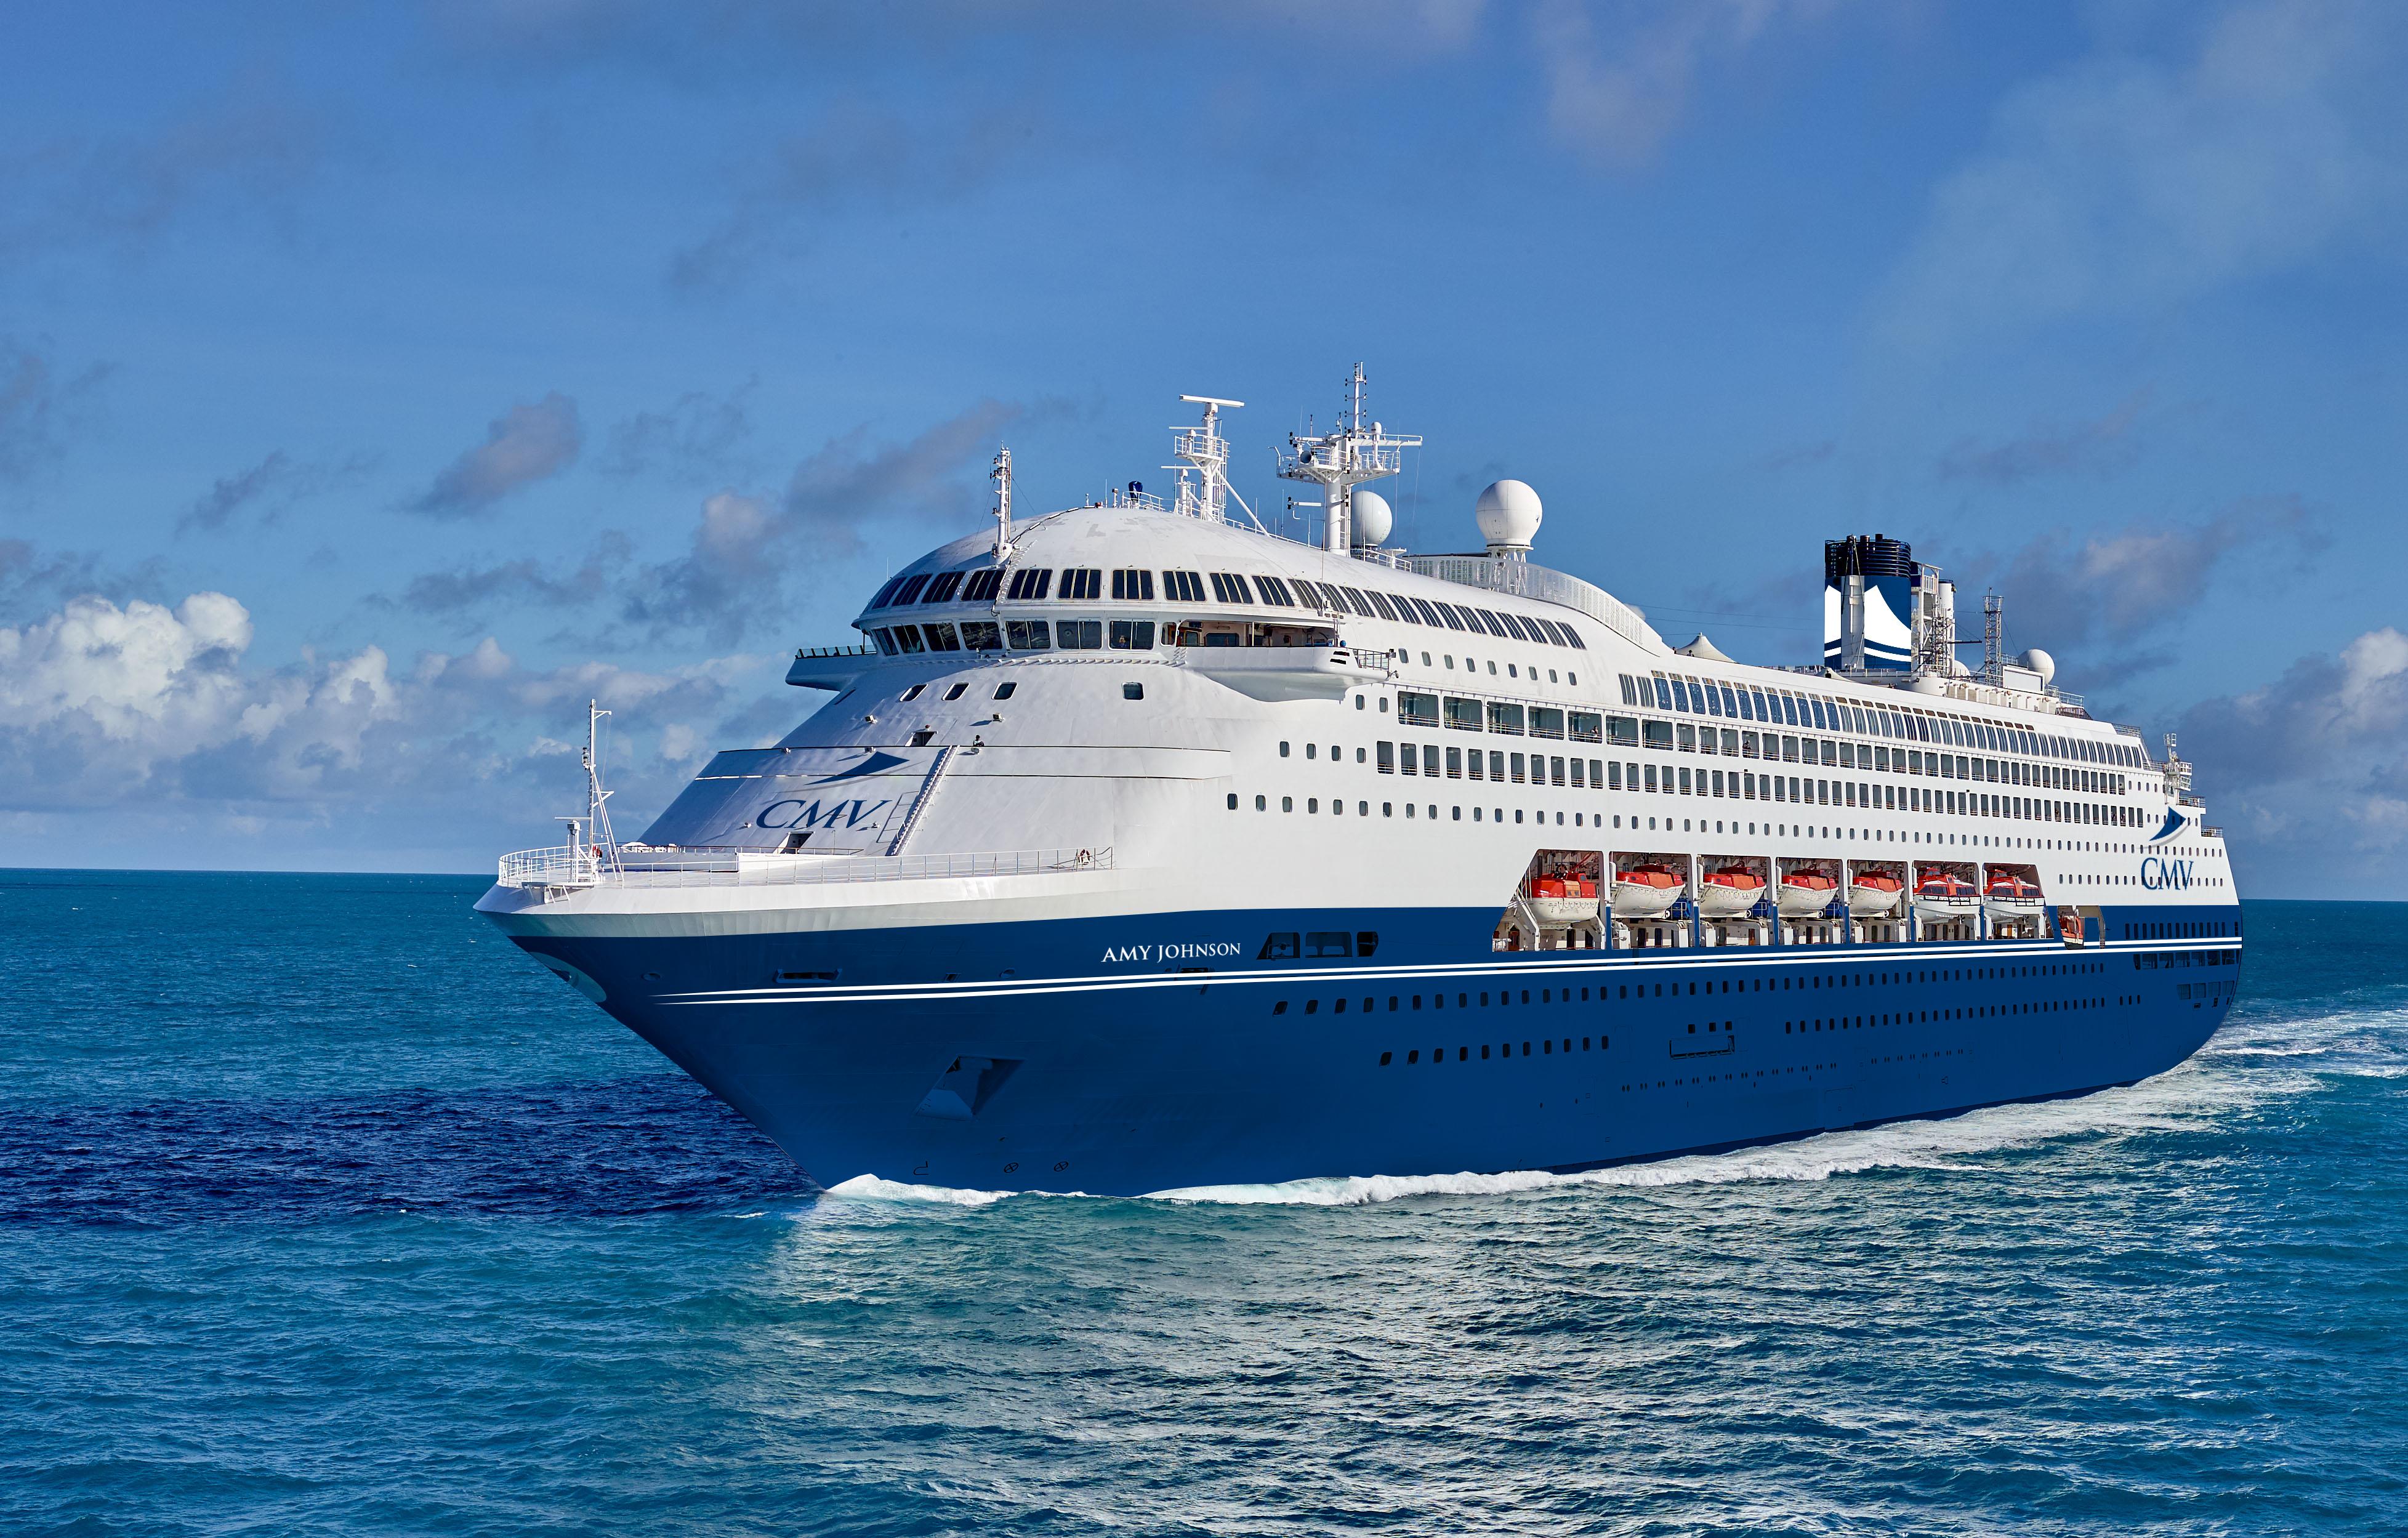 www.seatrade-cruise.com